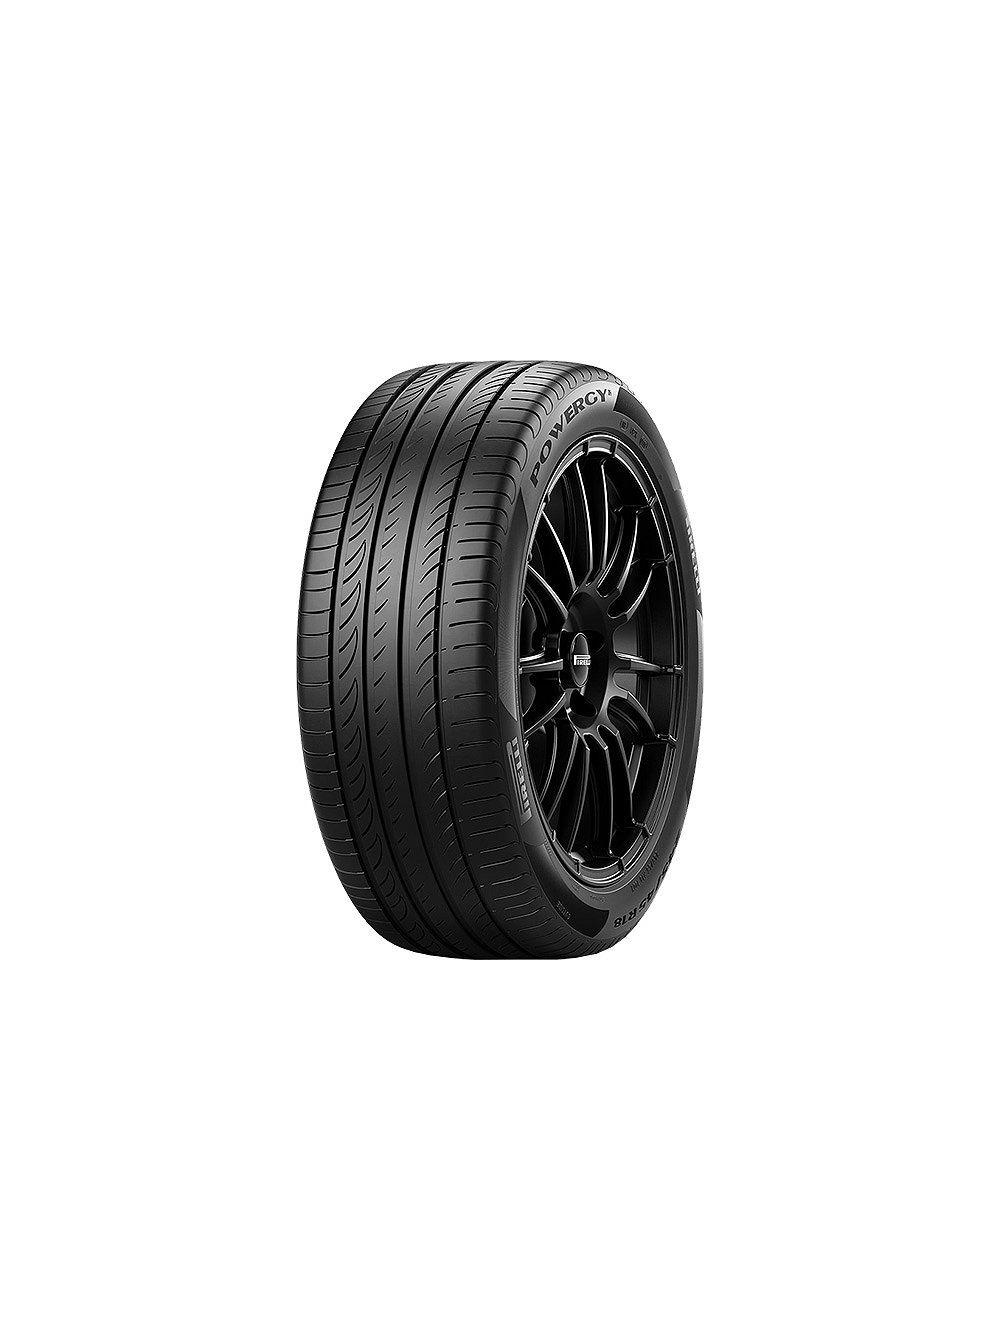 Pirelli 245/45R19 Y Powergy XL Nyári gumi